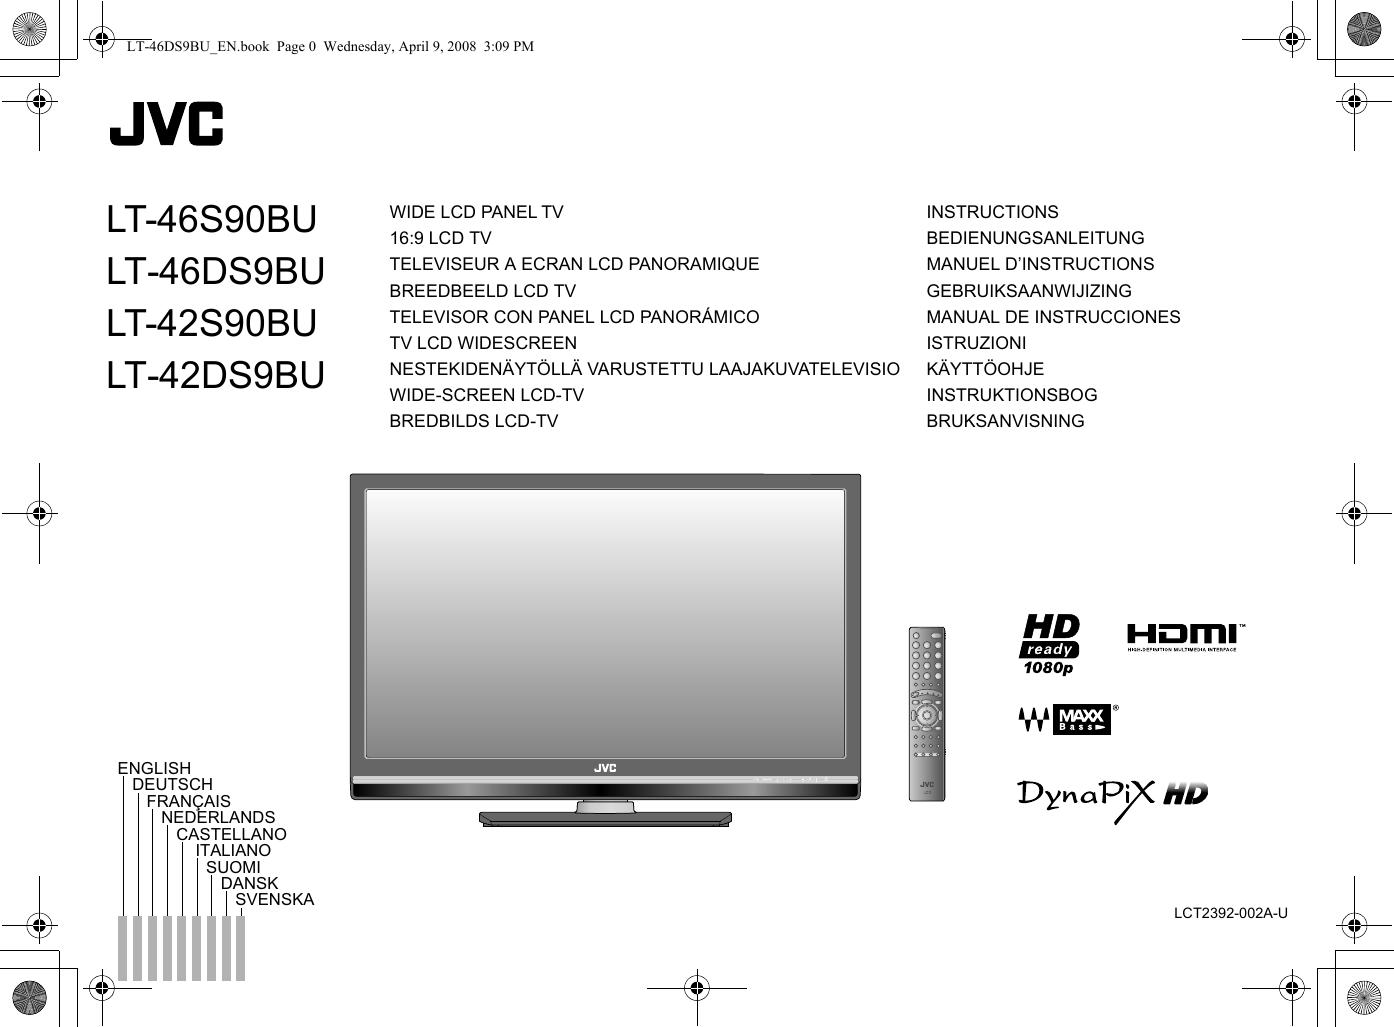 Jvc Lt 42ds9bu 46s90bu 46ds9bu 42s90bu User Manual Blaupunkt 420 Bt Wiring Diagram Lct2392 002a U En